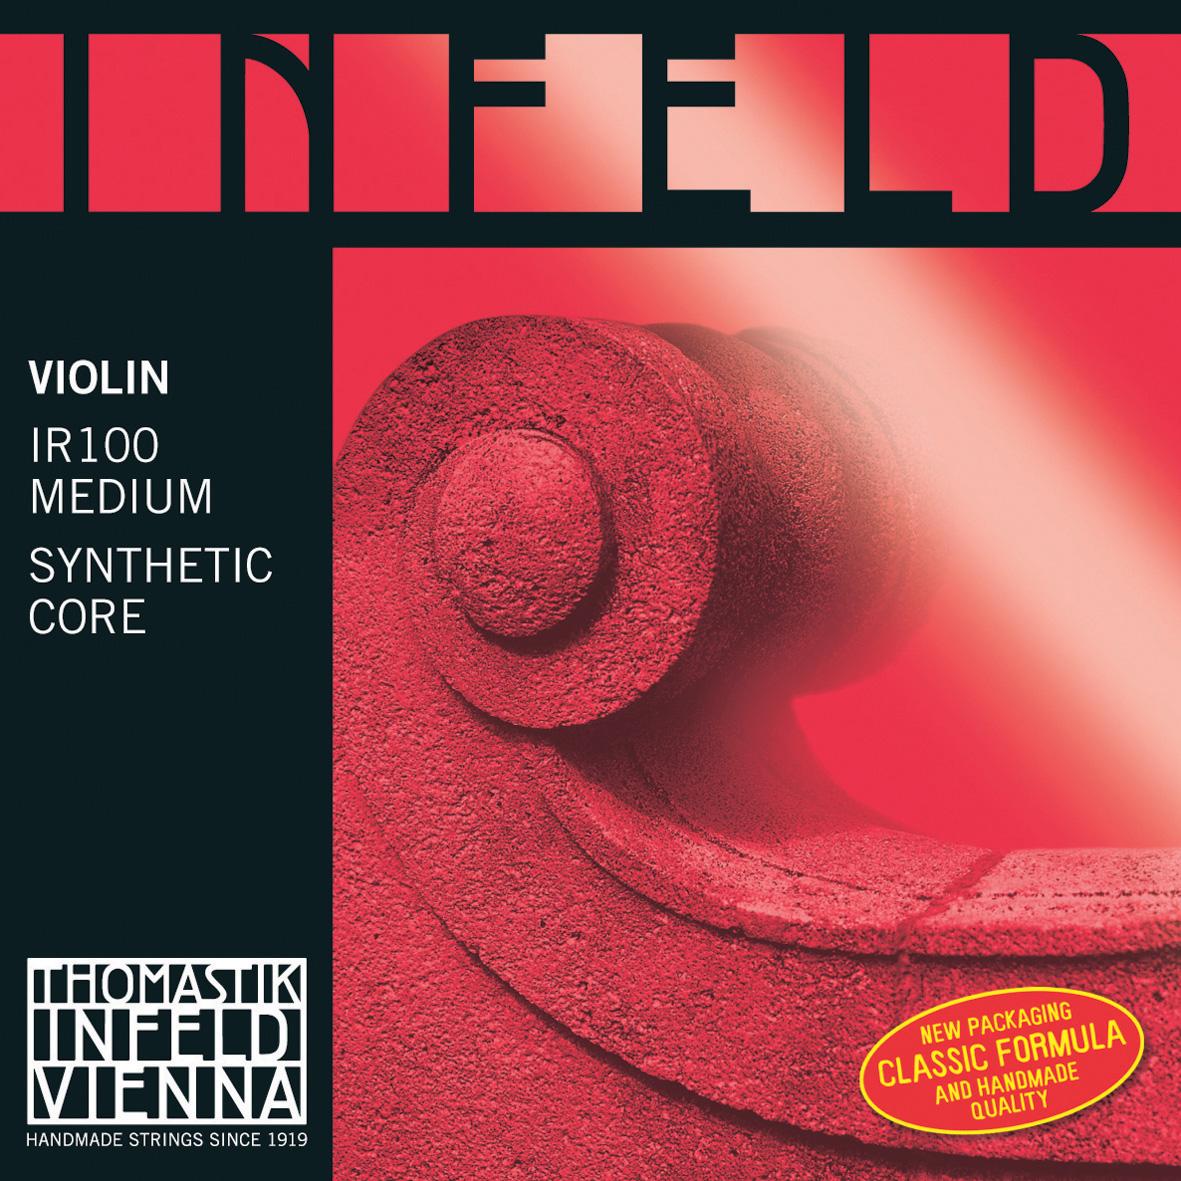 Infeld Red Thomastik Strings